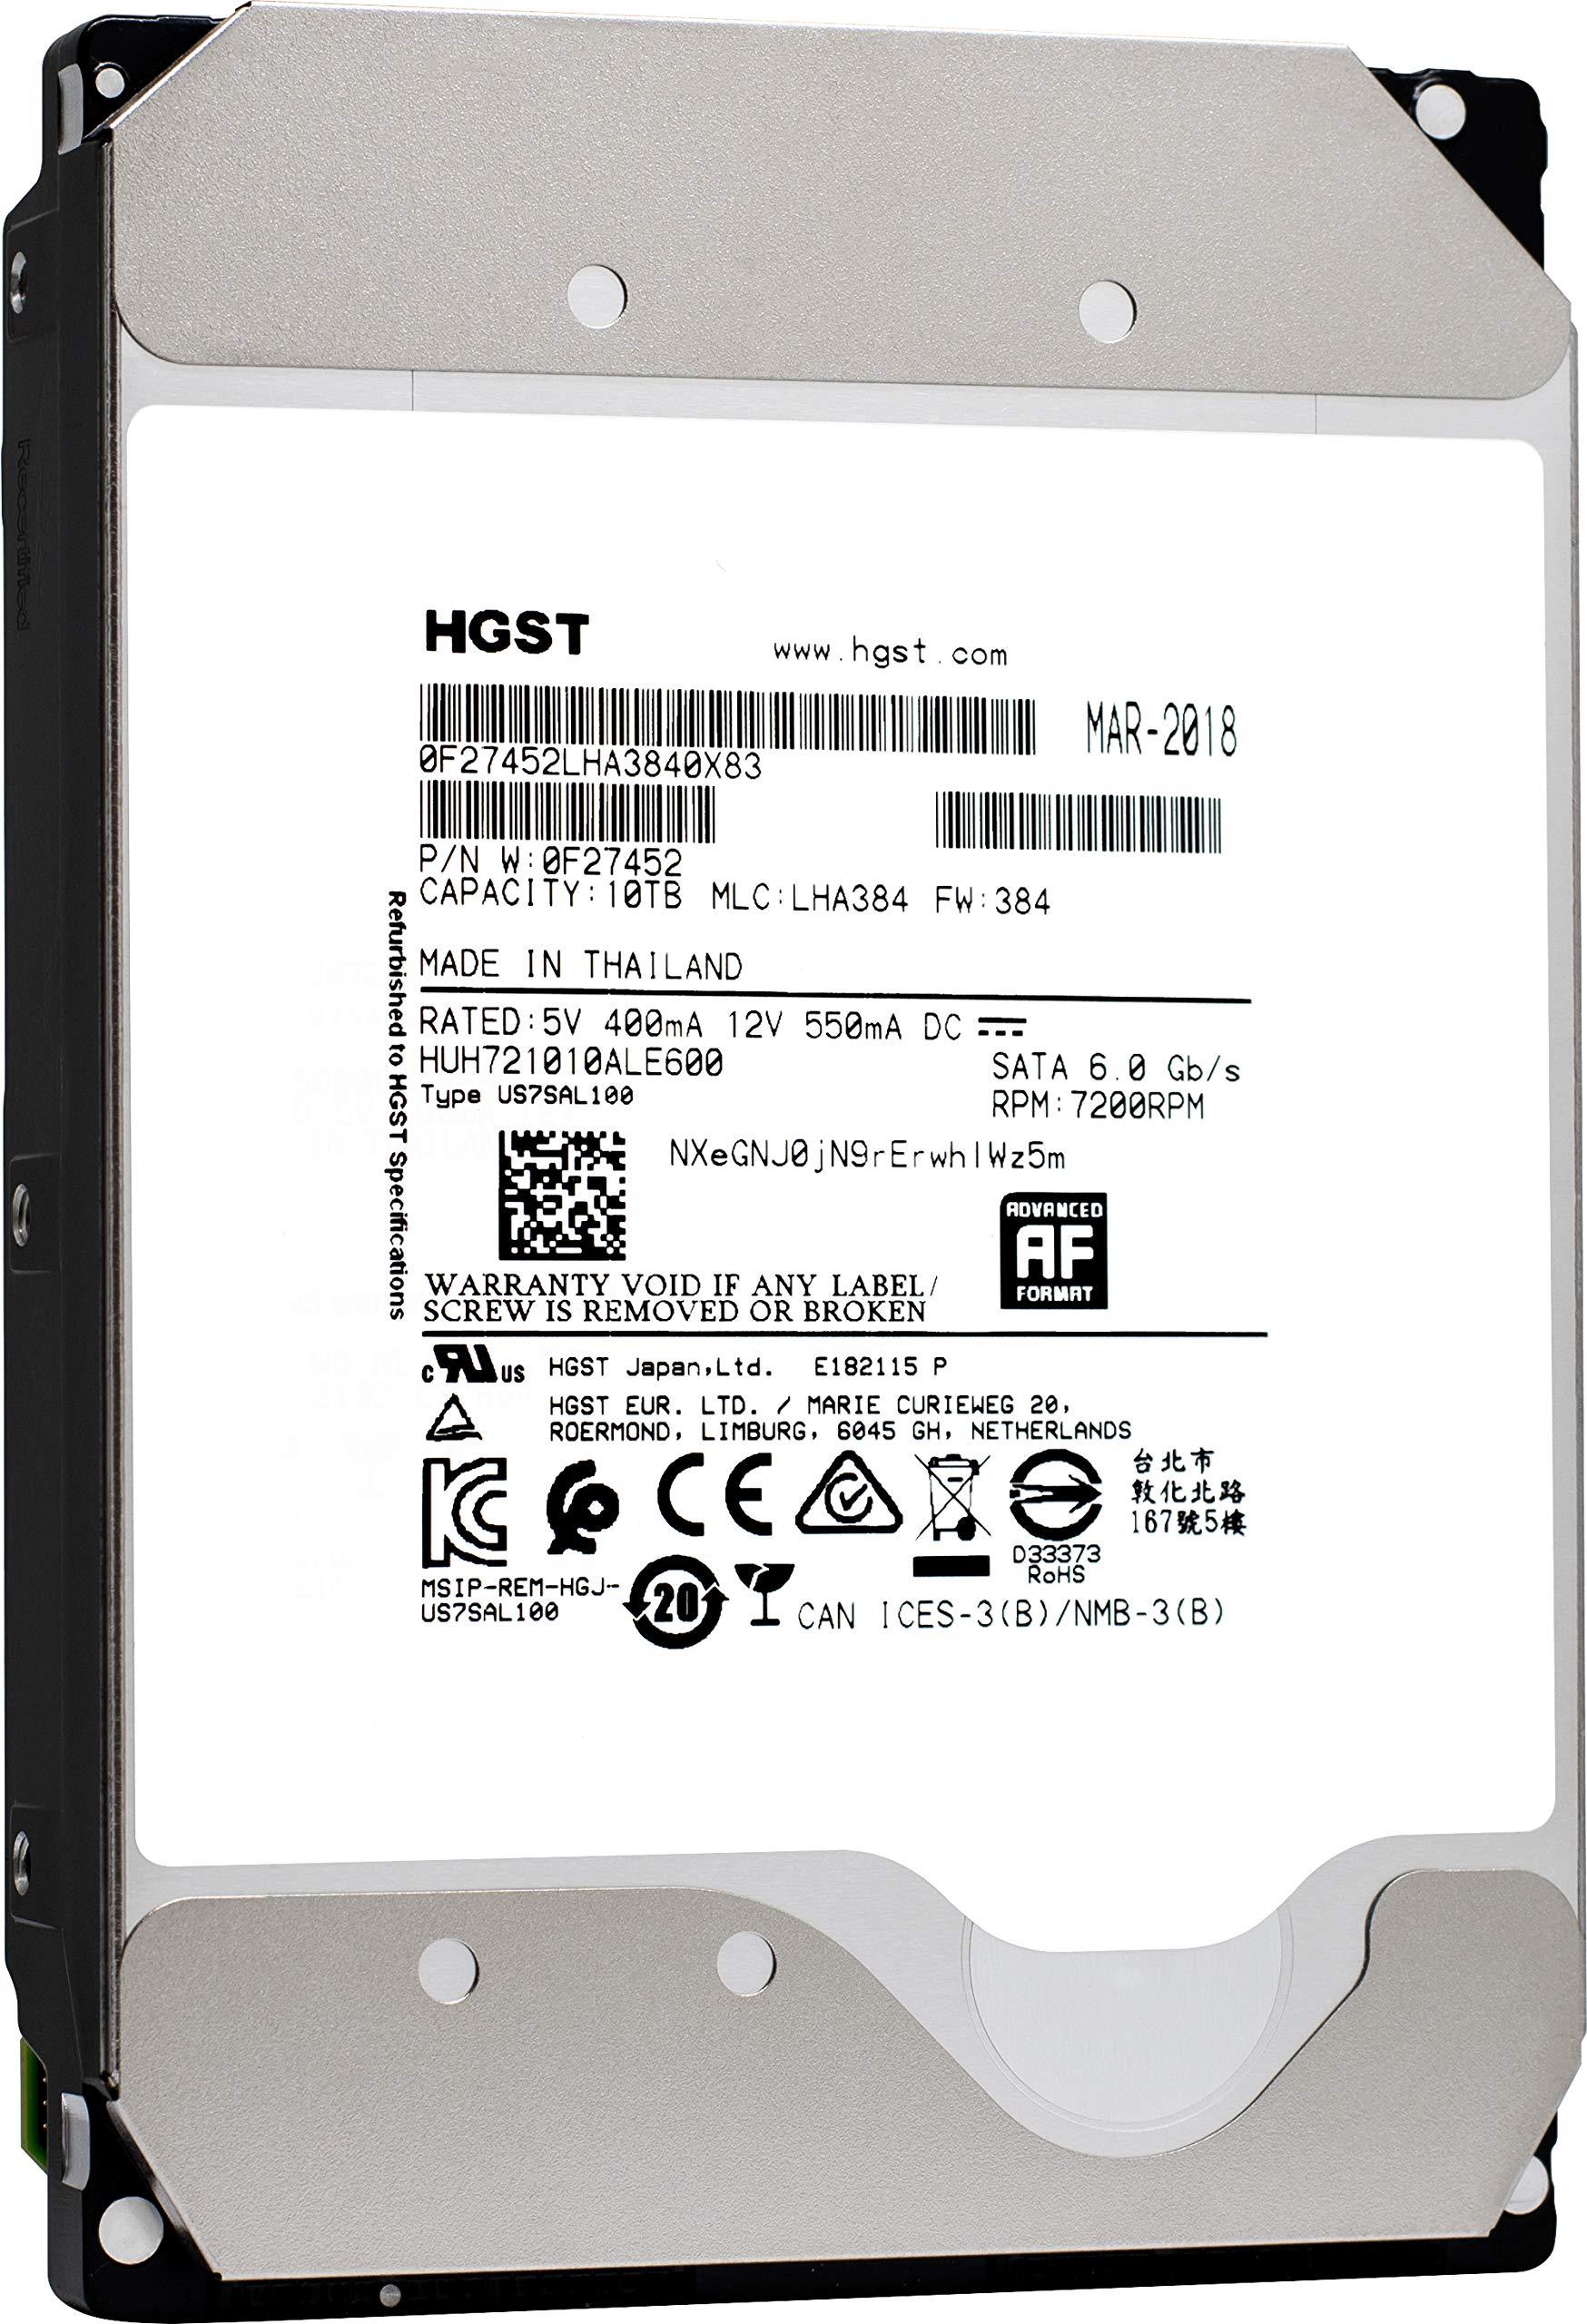 HGST Ultrastar He10 | HUH721010ALE600| 0F27452 | 512e | 10TB SATA 6.0Gb/s 7200 RPM 256MB Cache 3.5in | Enterprise Hard Drive HDD,  (Renewed) by HGST (Image #1)